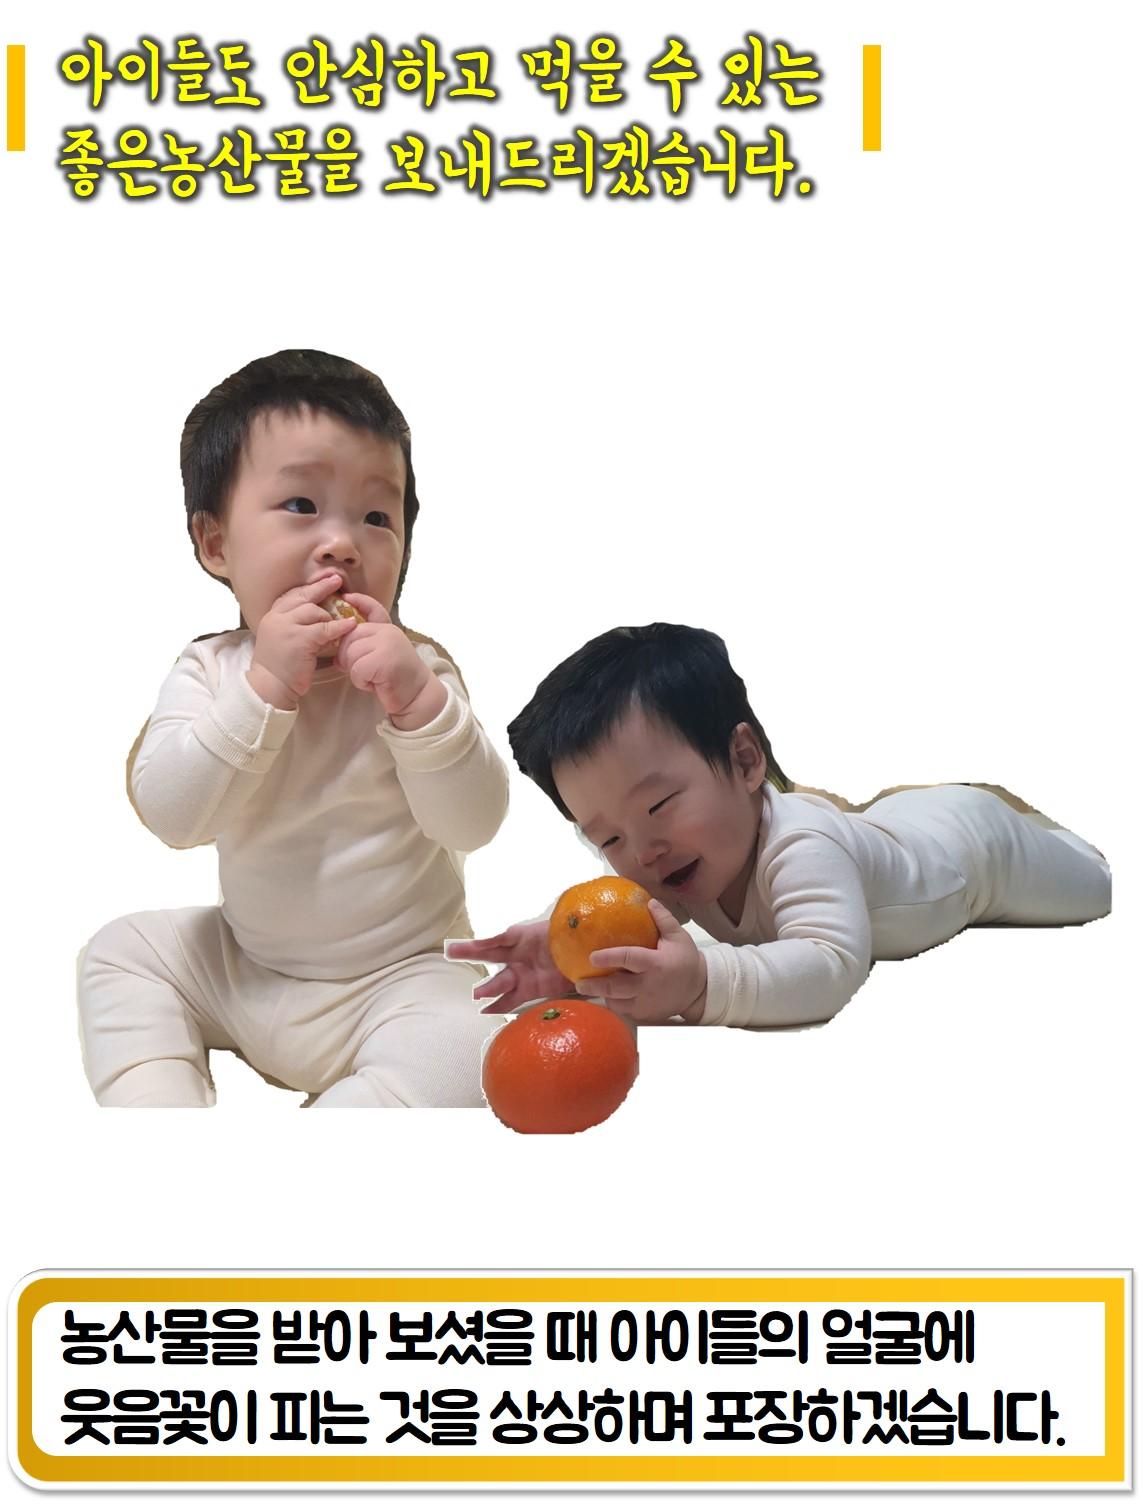 deb2012b444373de2ad94cae84d1cc6c_1607924521_04.jpg